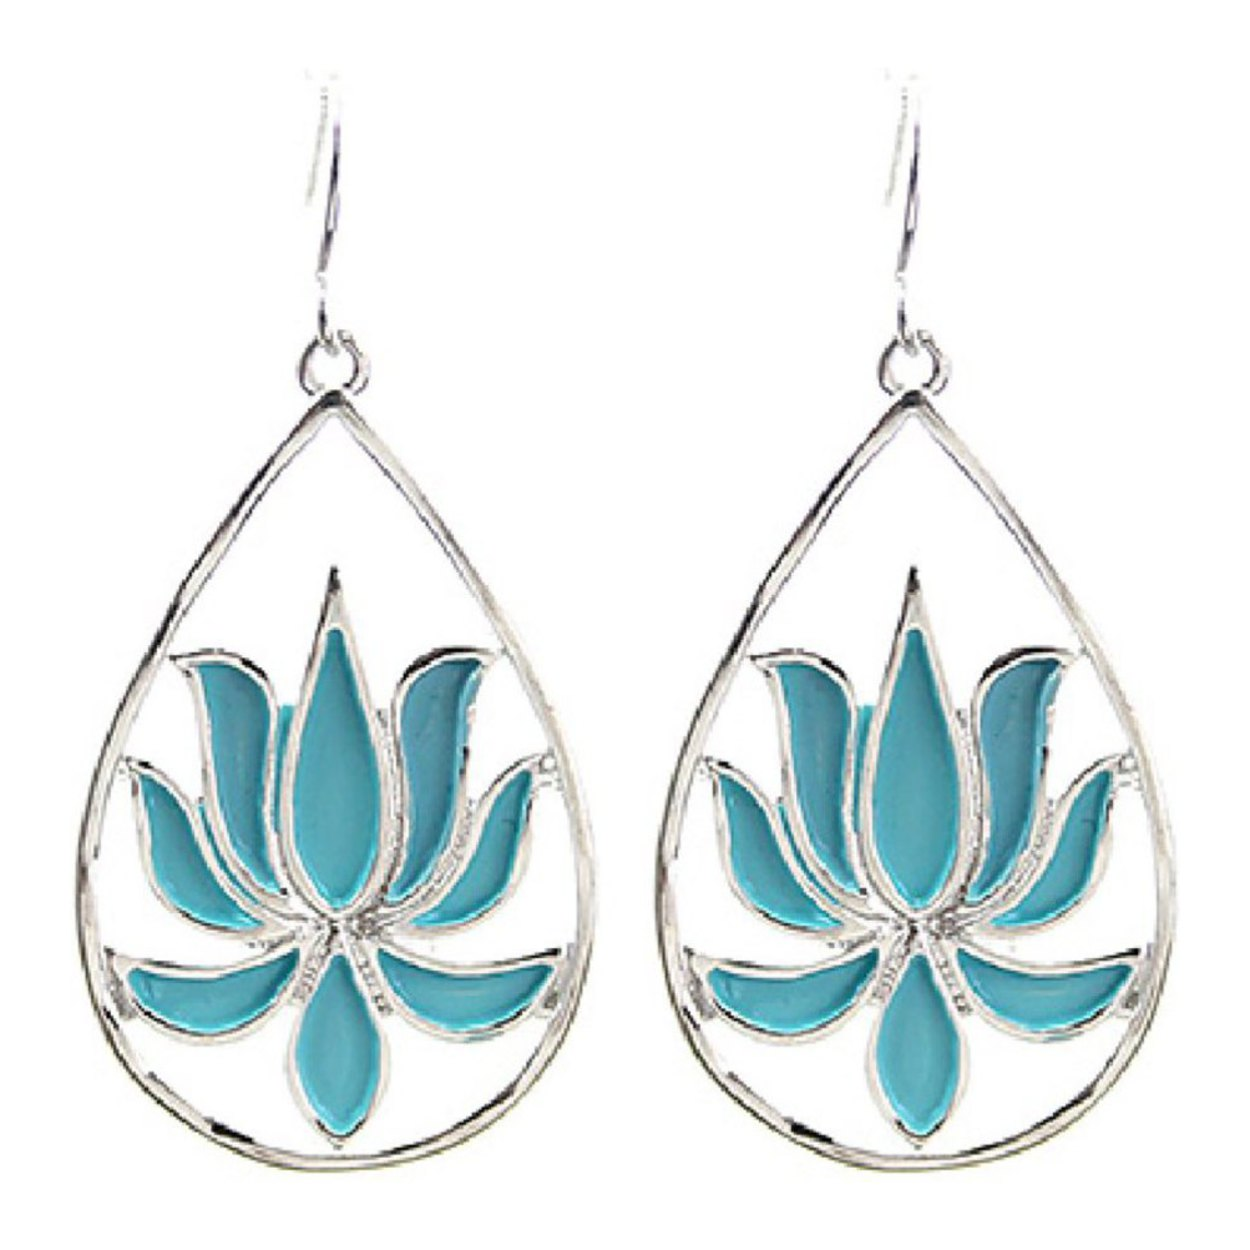 Aqua blue open teardrop lotus flower earrings 175 authentic lotus lotus flower teardrop earrings inspired by ancient egypt are decorated in an aqua blue enameling earrings hang 175 inch flower measures 20mm by 22mm izmirmasajfo